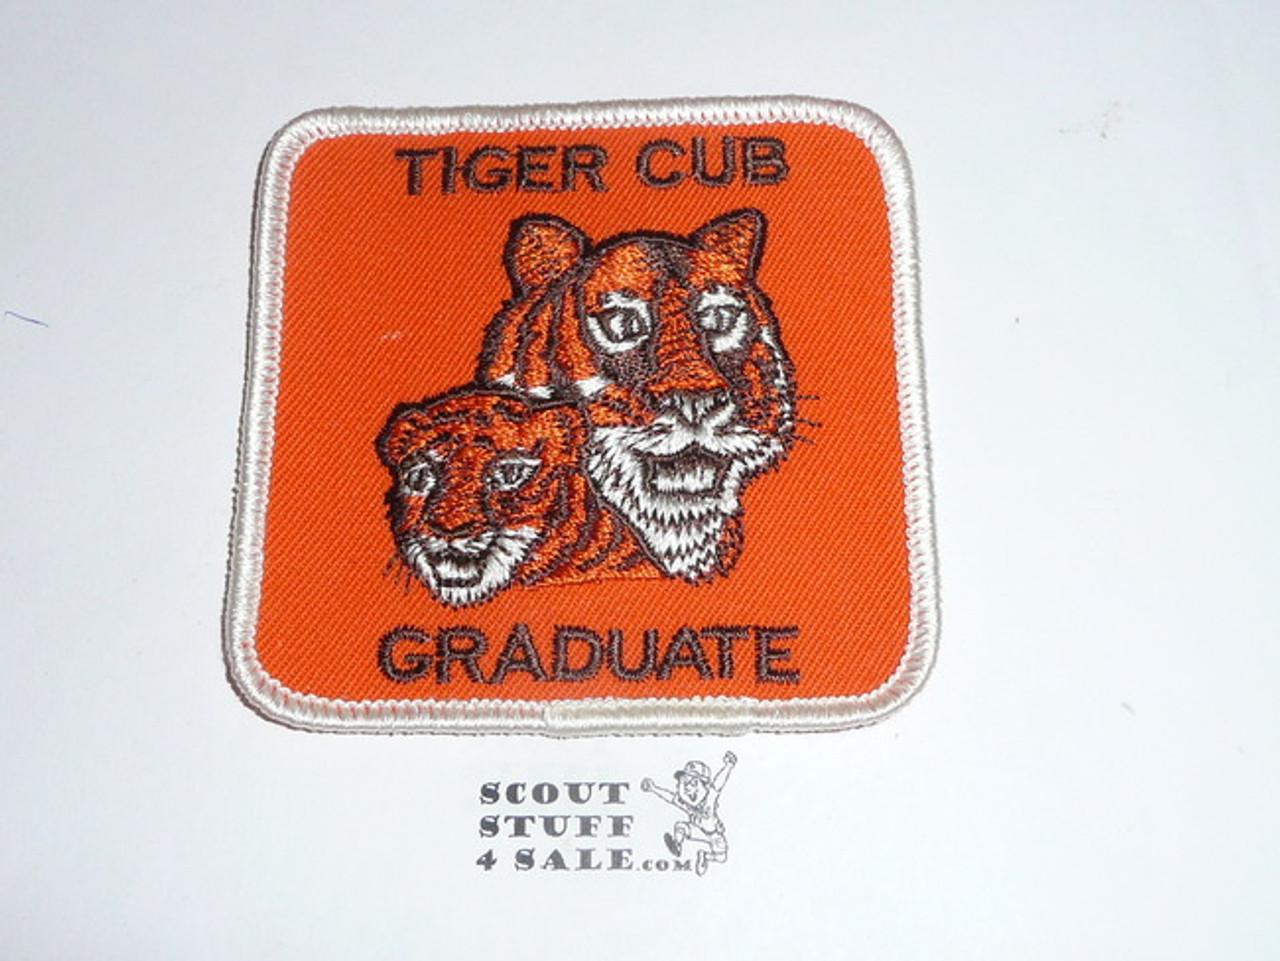 Tiger Cub Graduate Patch